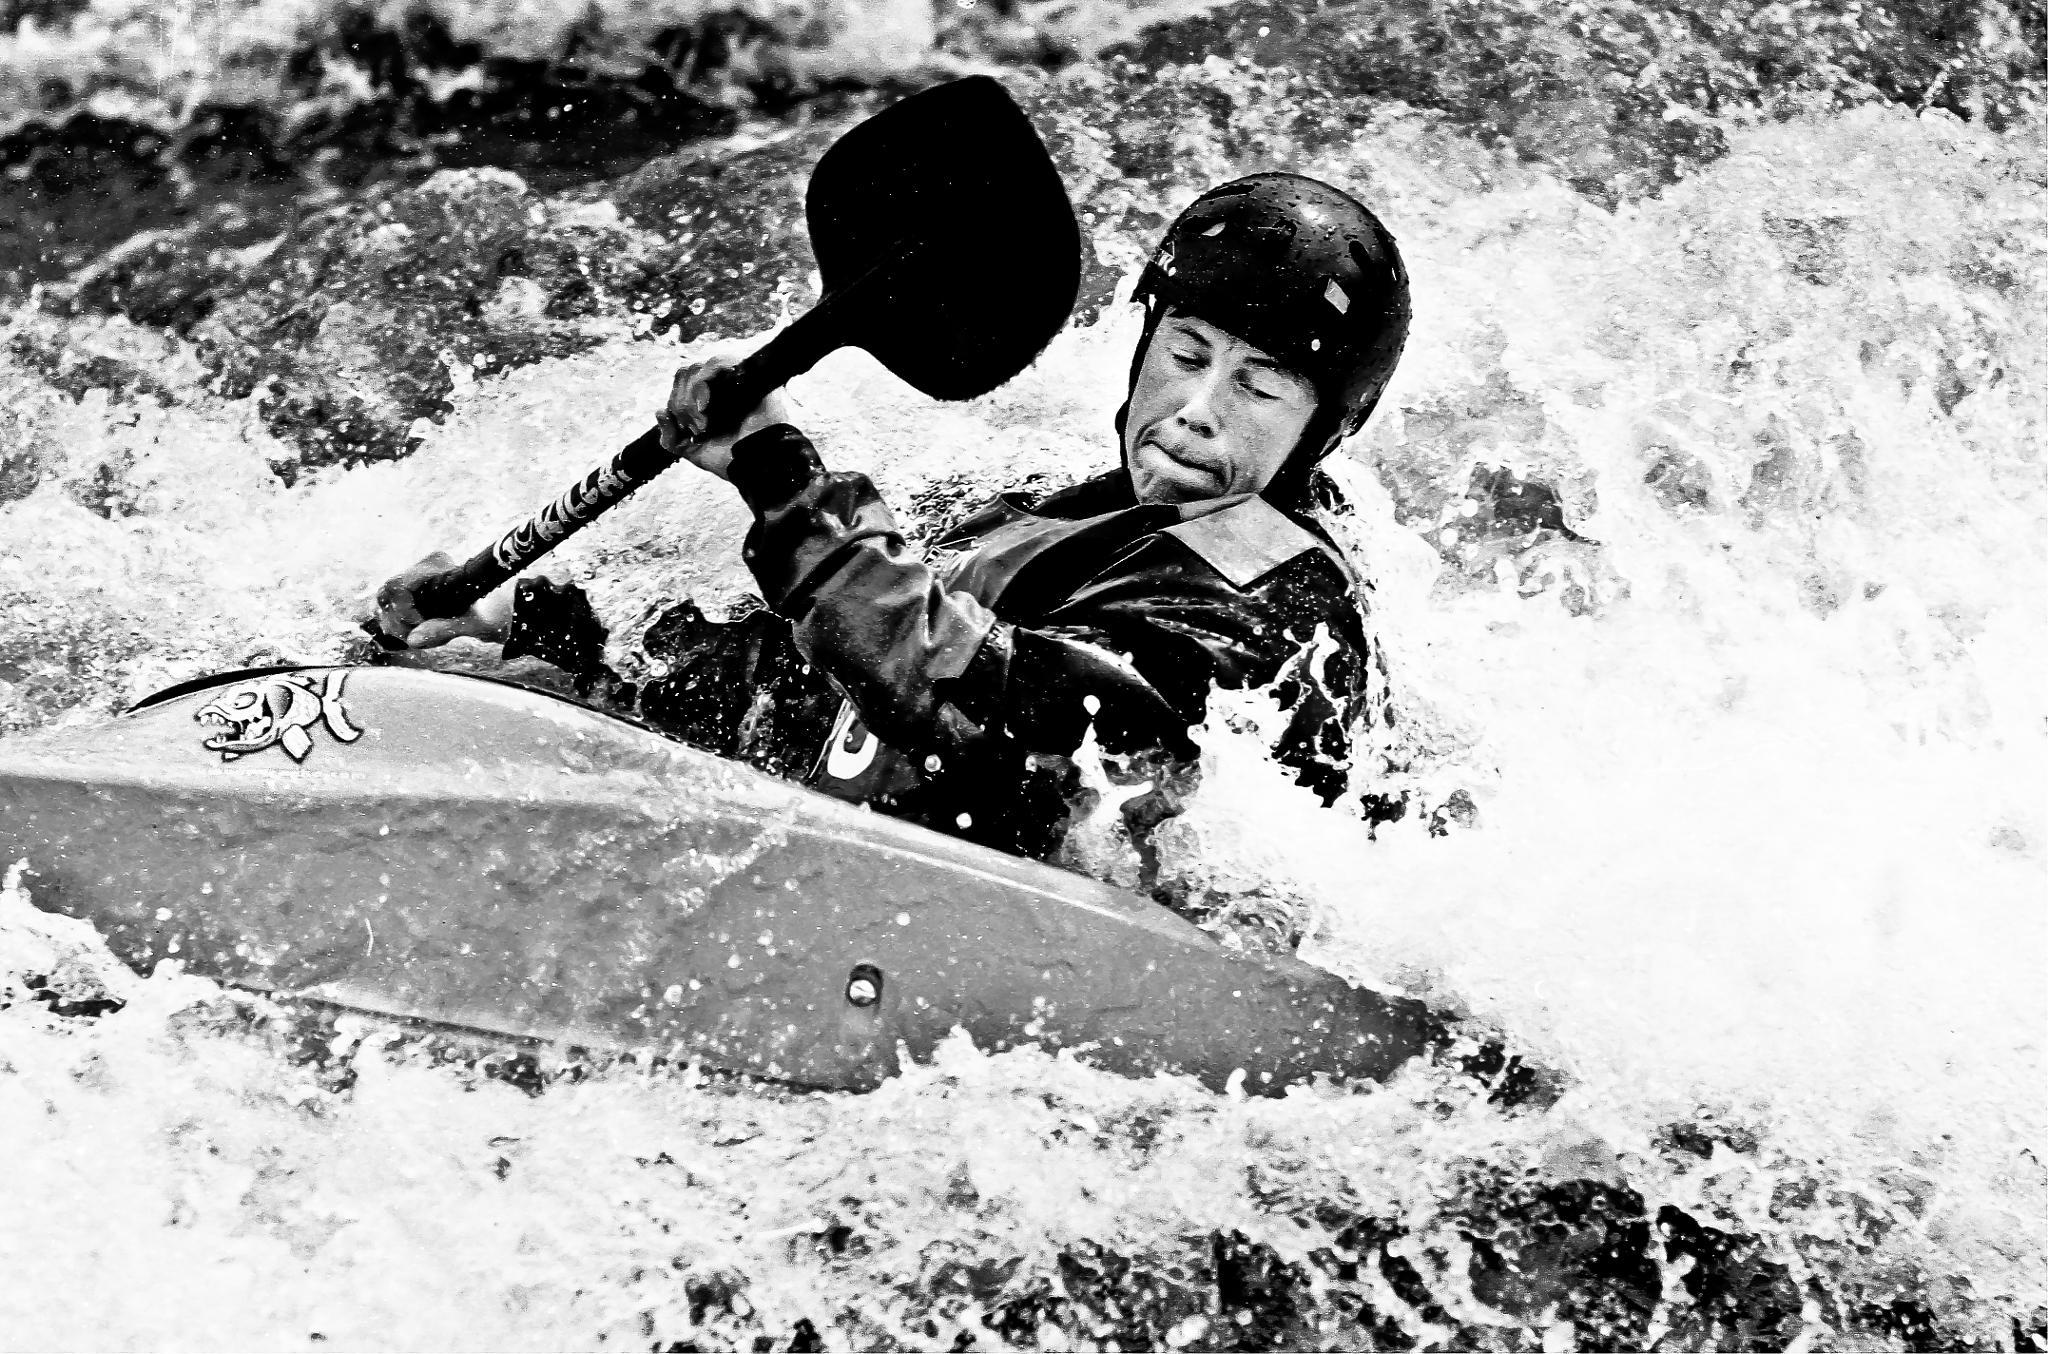 Canoeist. by Peter Edwardo Vicente.